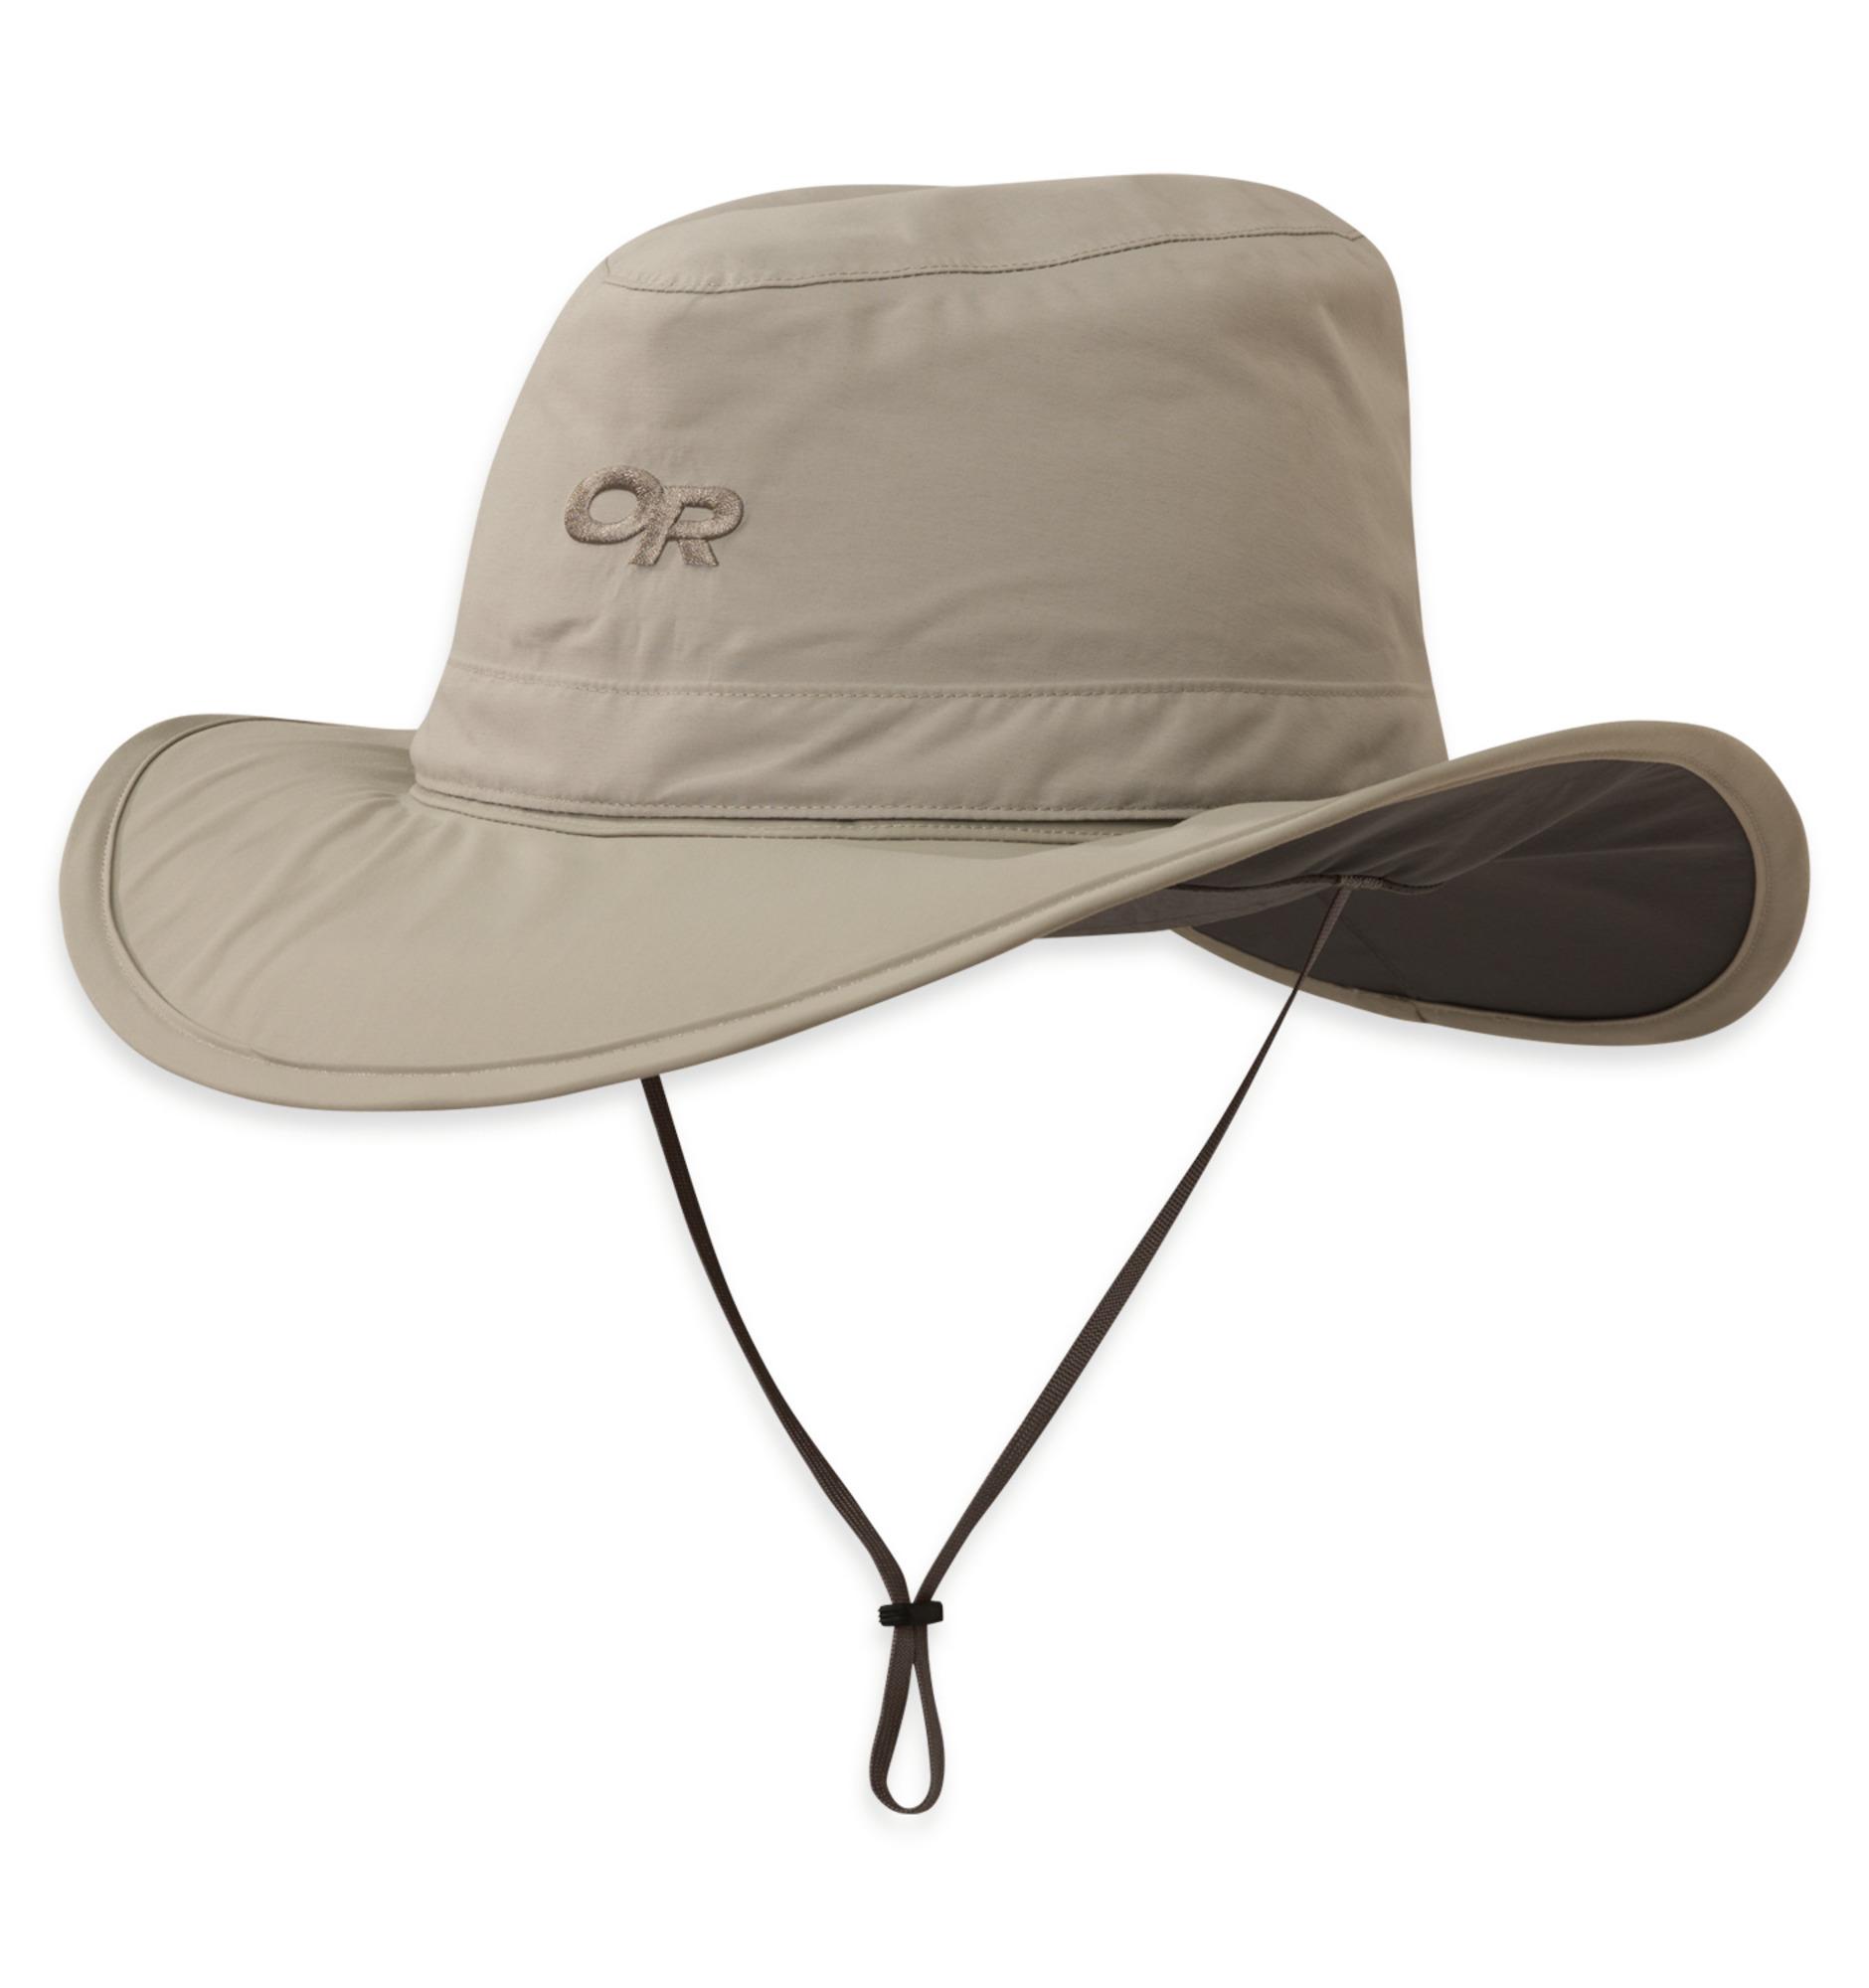 Outdoor Research Ghost Rain Hat-khaki-L - Gr. L